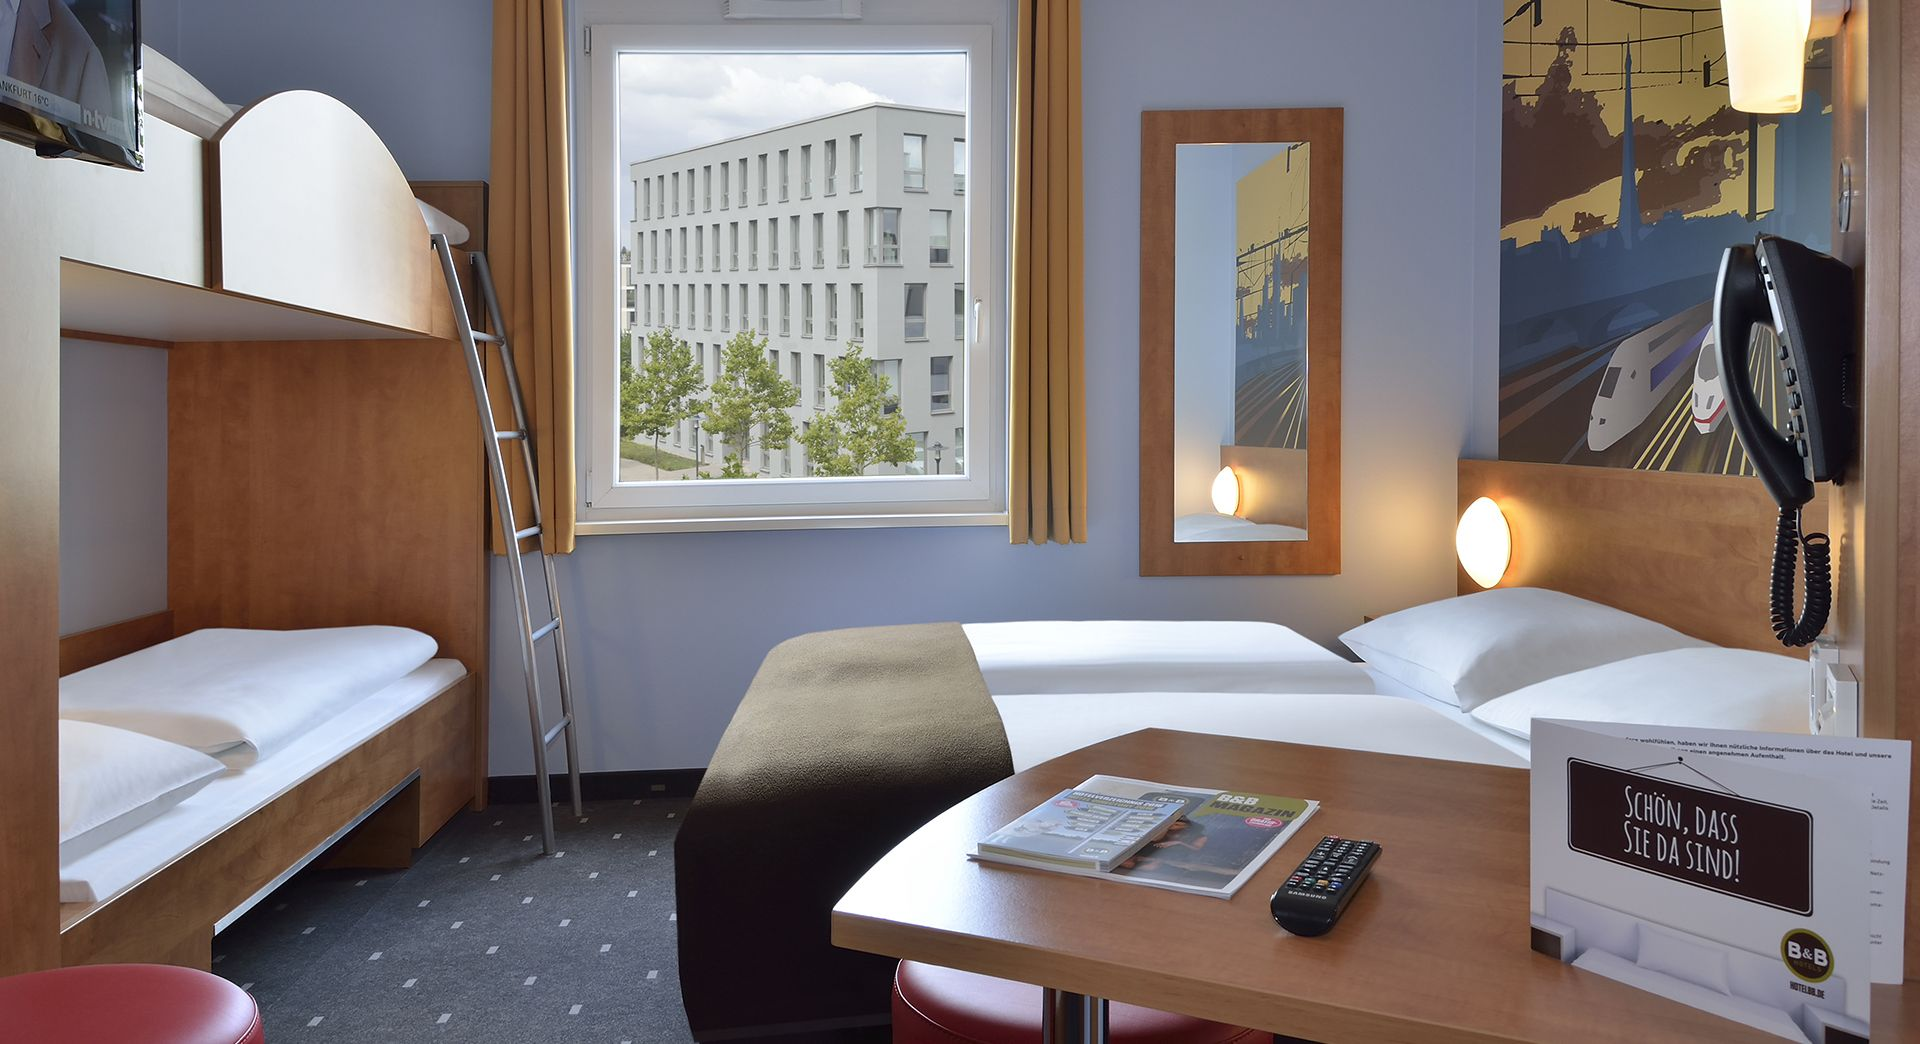 Familienzimmer im B&B Hotel Saarbrücken-Hbf | Saarbrücken | Pinterest